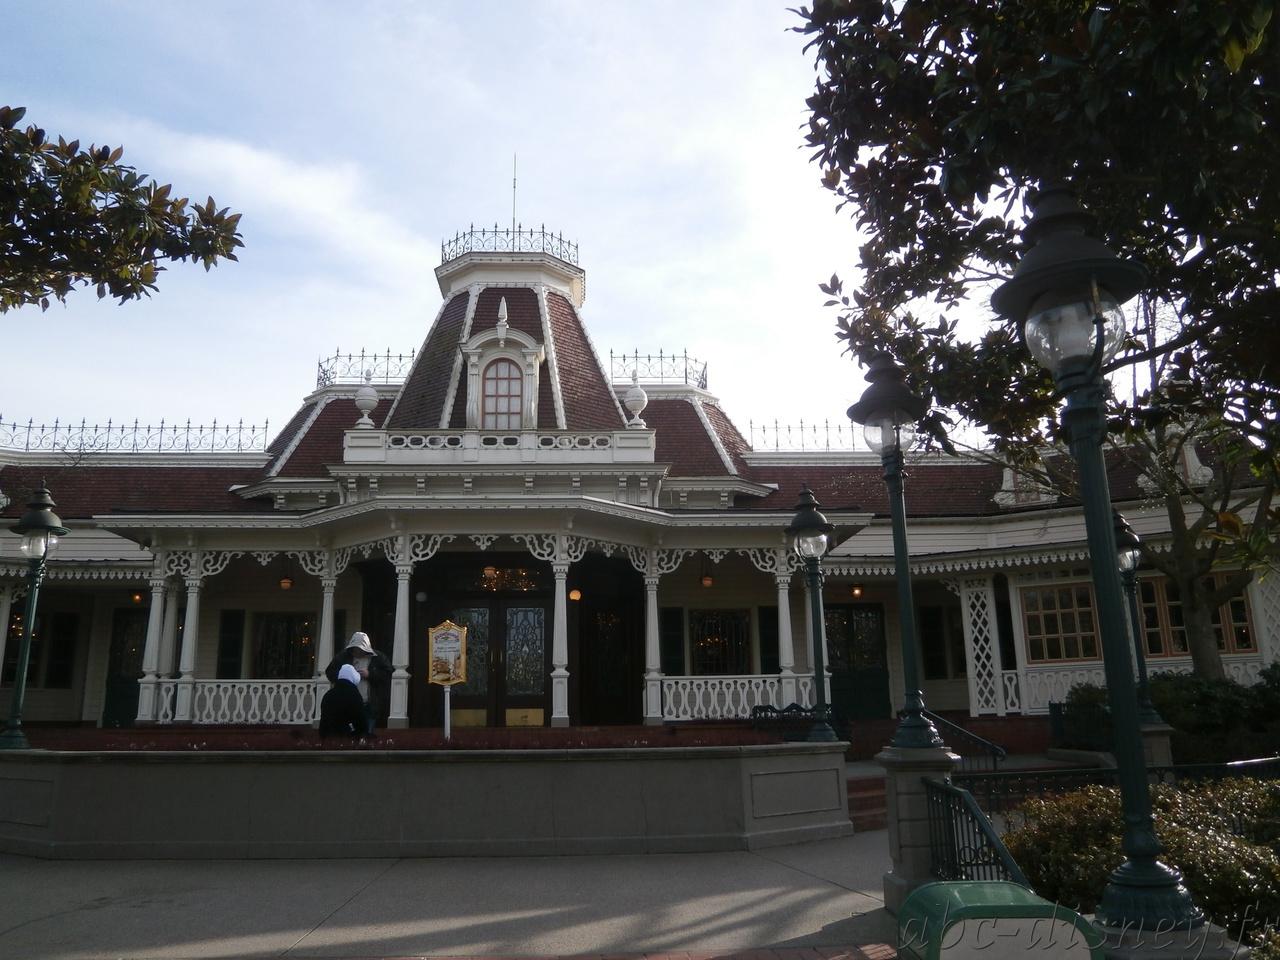 R plaza gardens 5